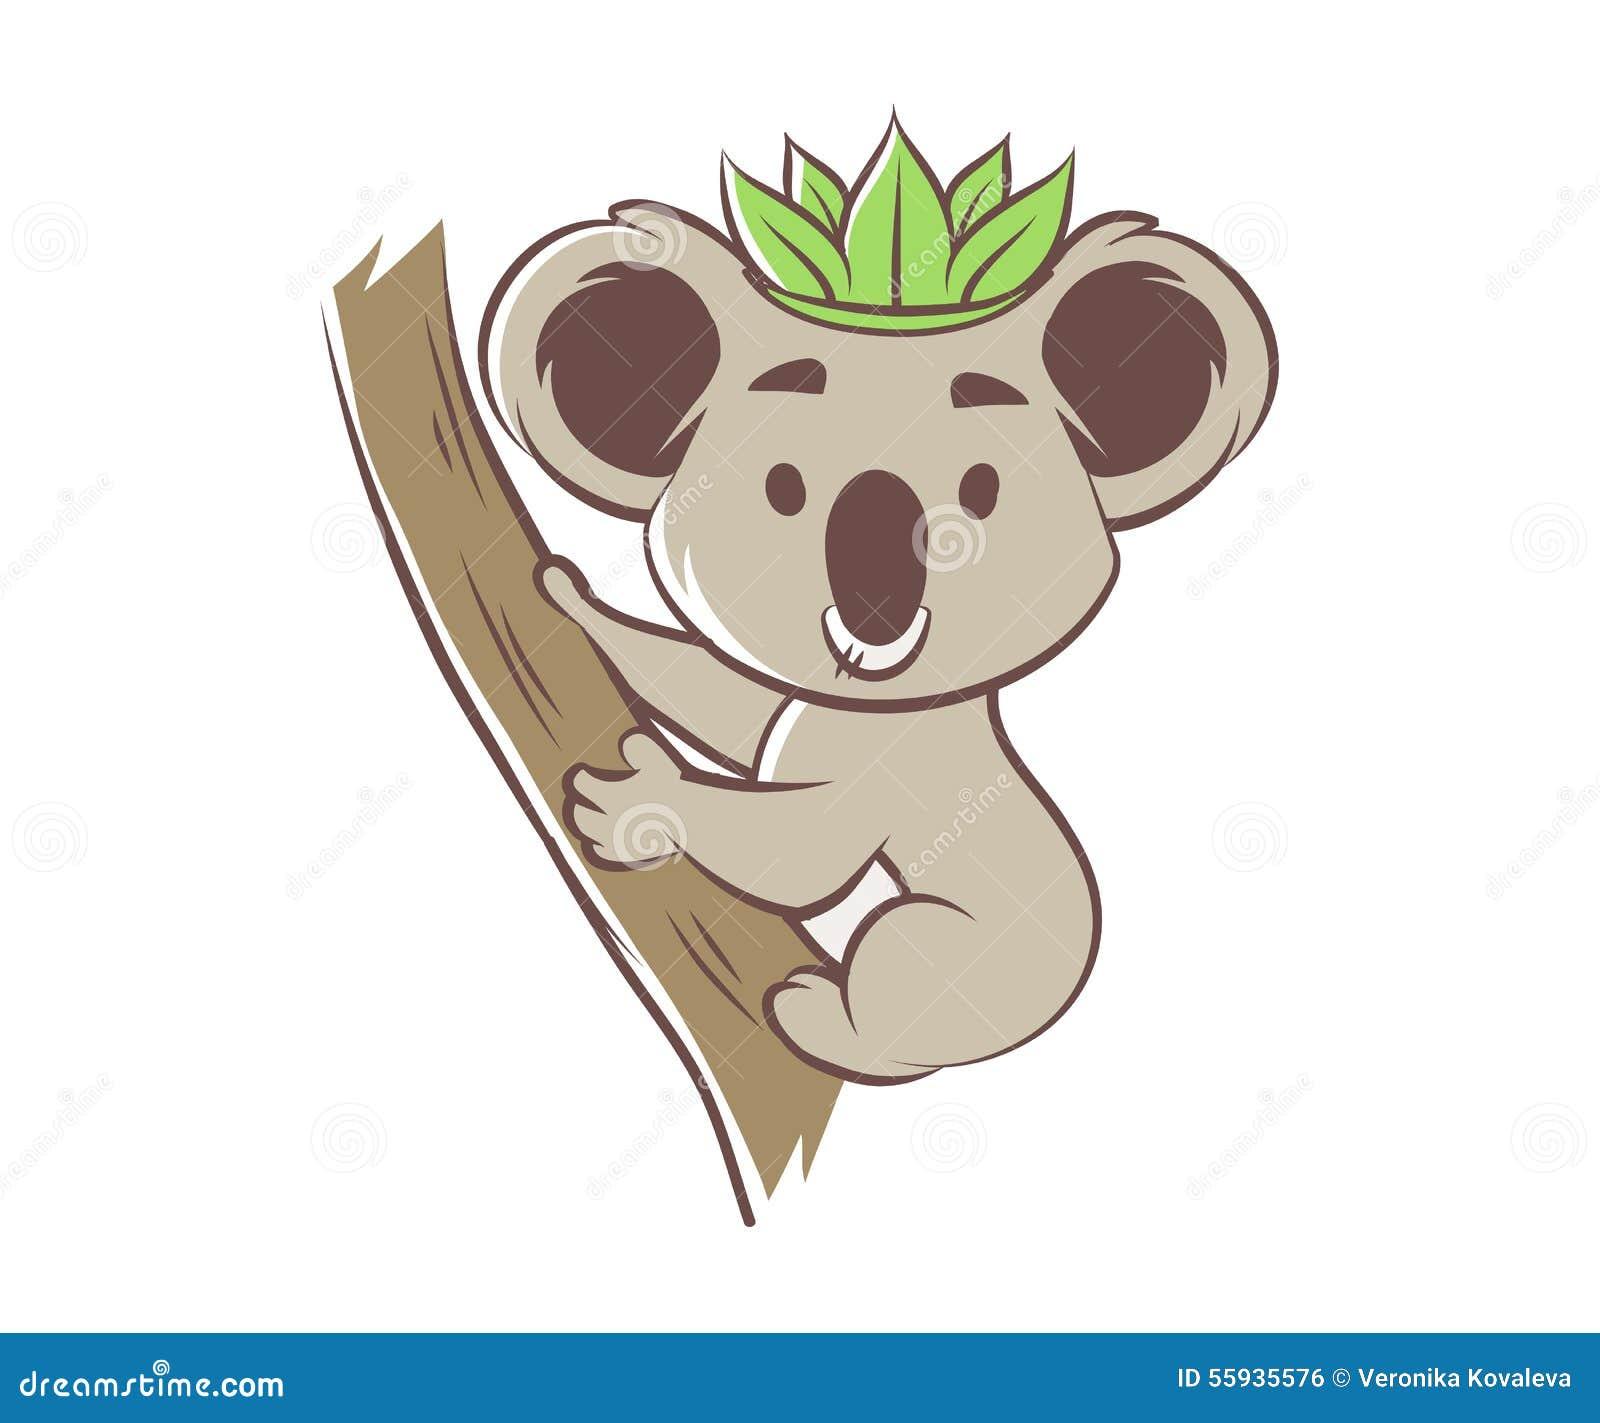 Stock Illustration Cute Cartoon Koala Bear Tree Vector Illustration Im...